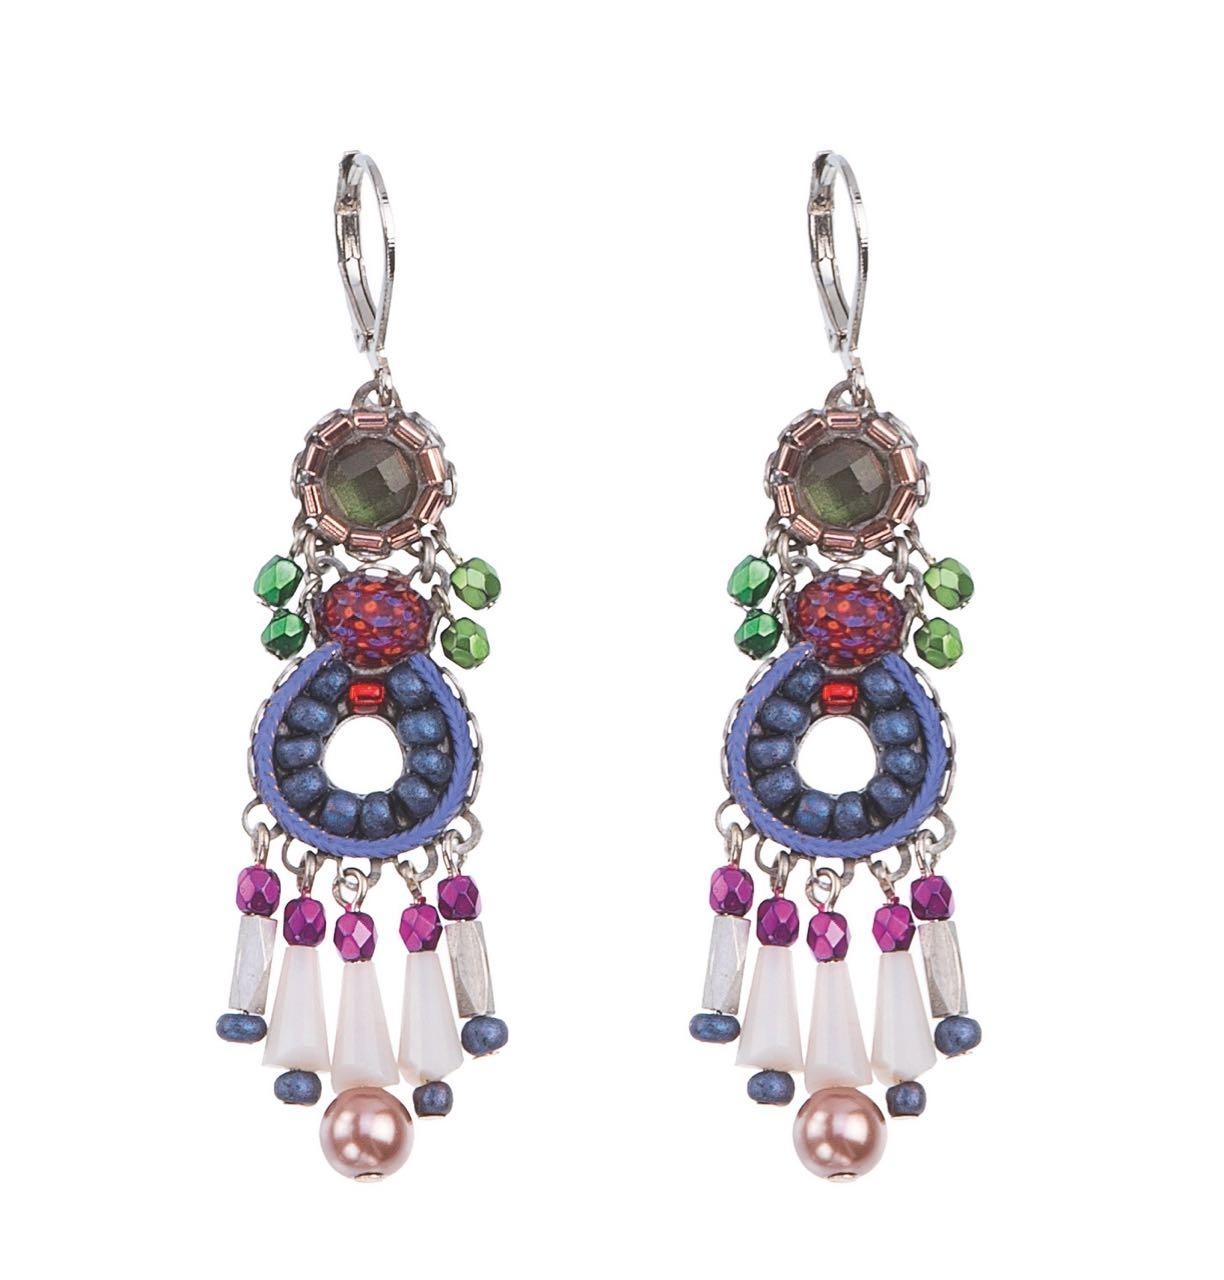 ayala bar earrings 1244 classic collection aurora